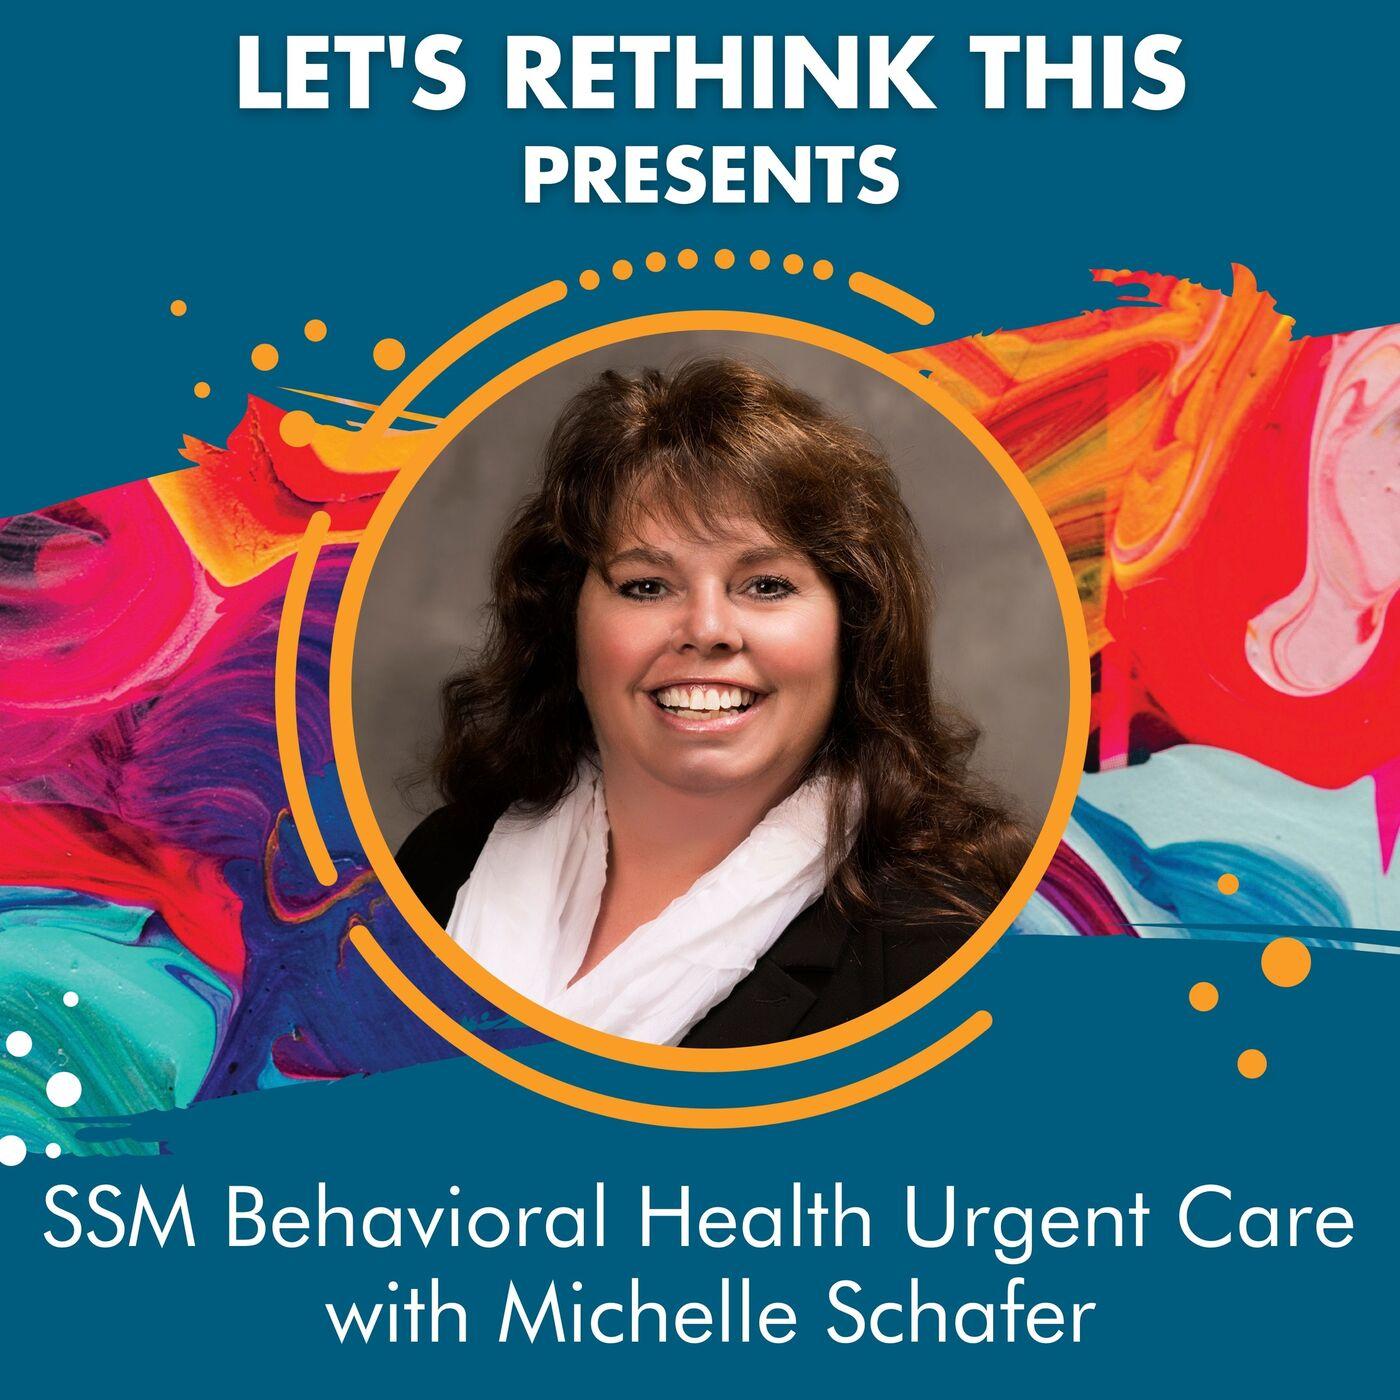 SSM Behavioral Health Urgent Care